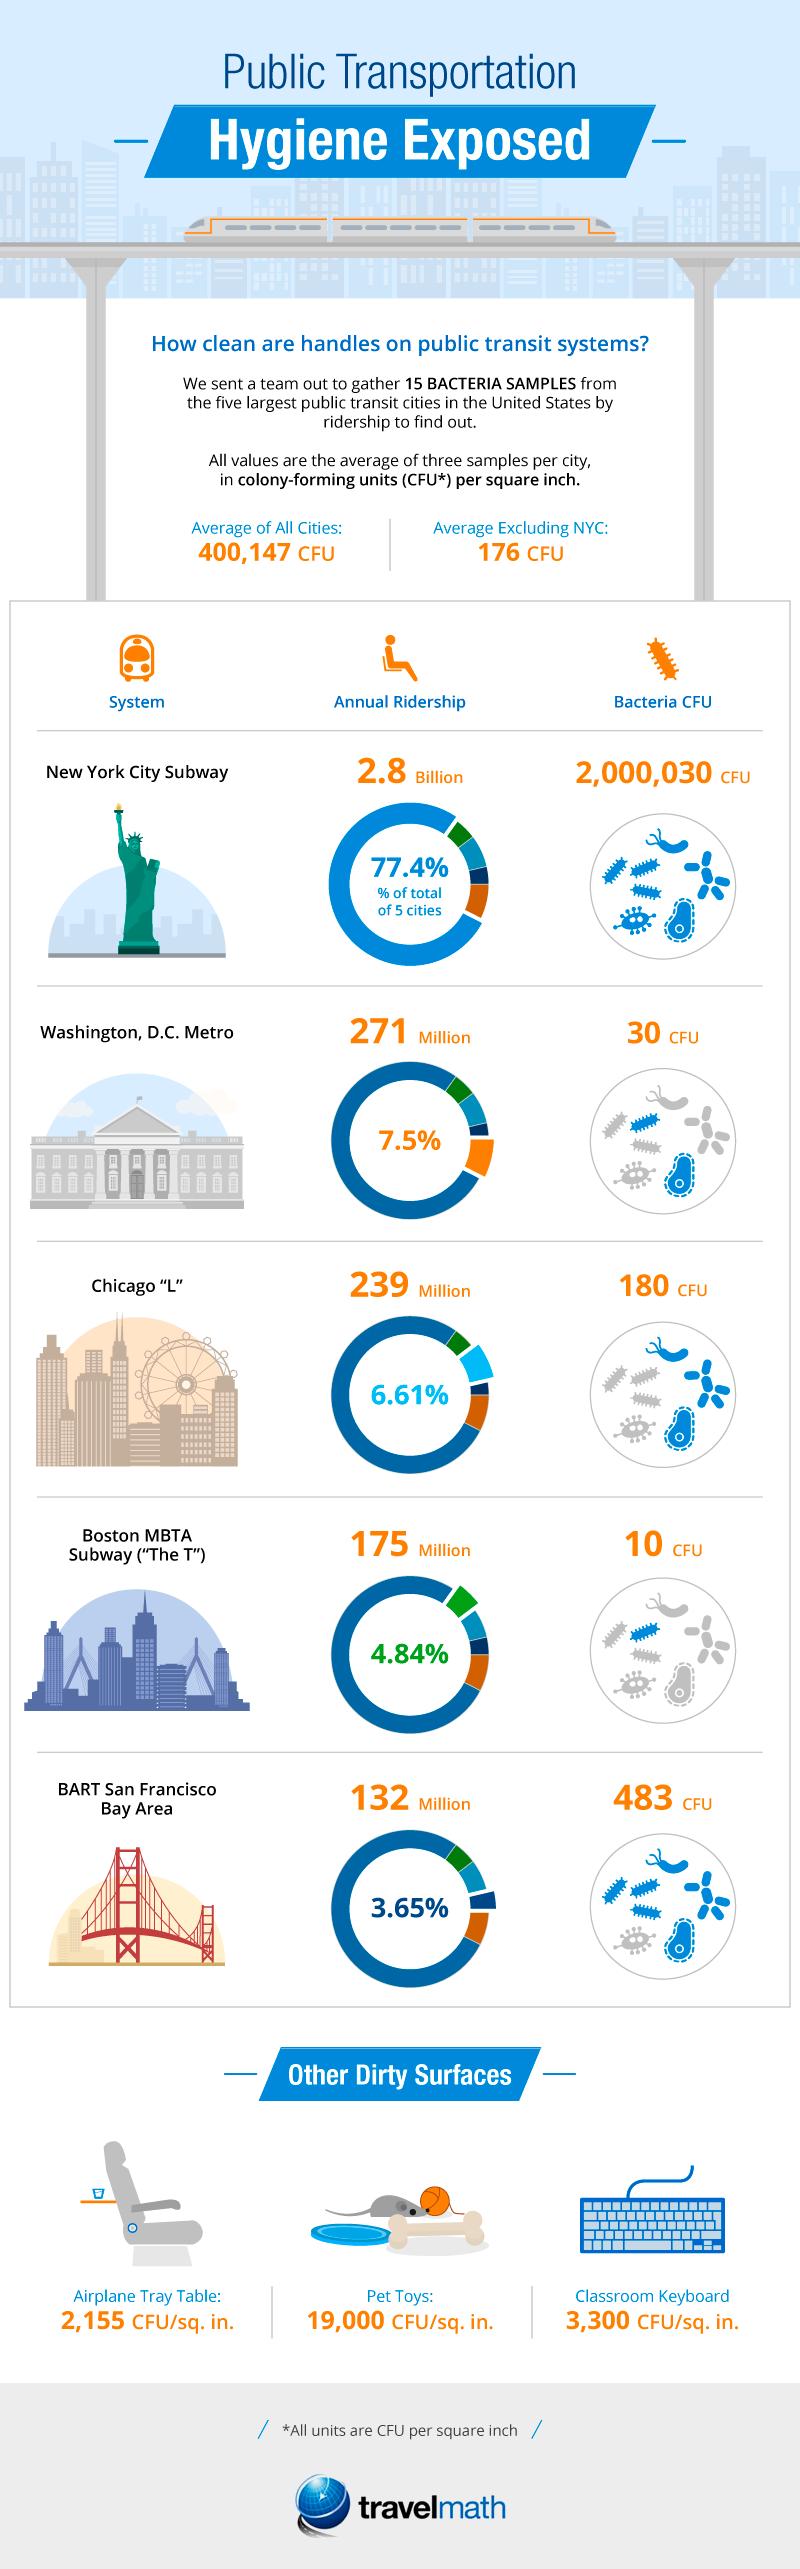 Public Transportation Hygiene Exposed Infographic